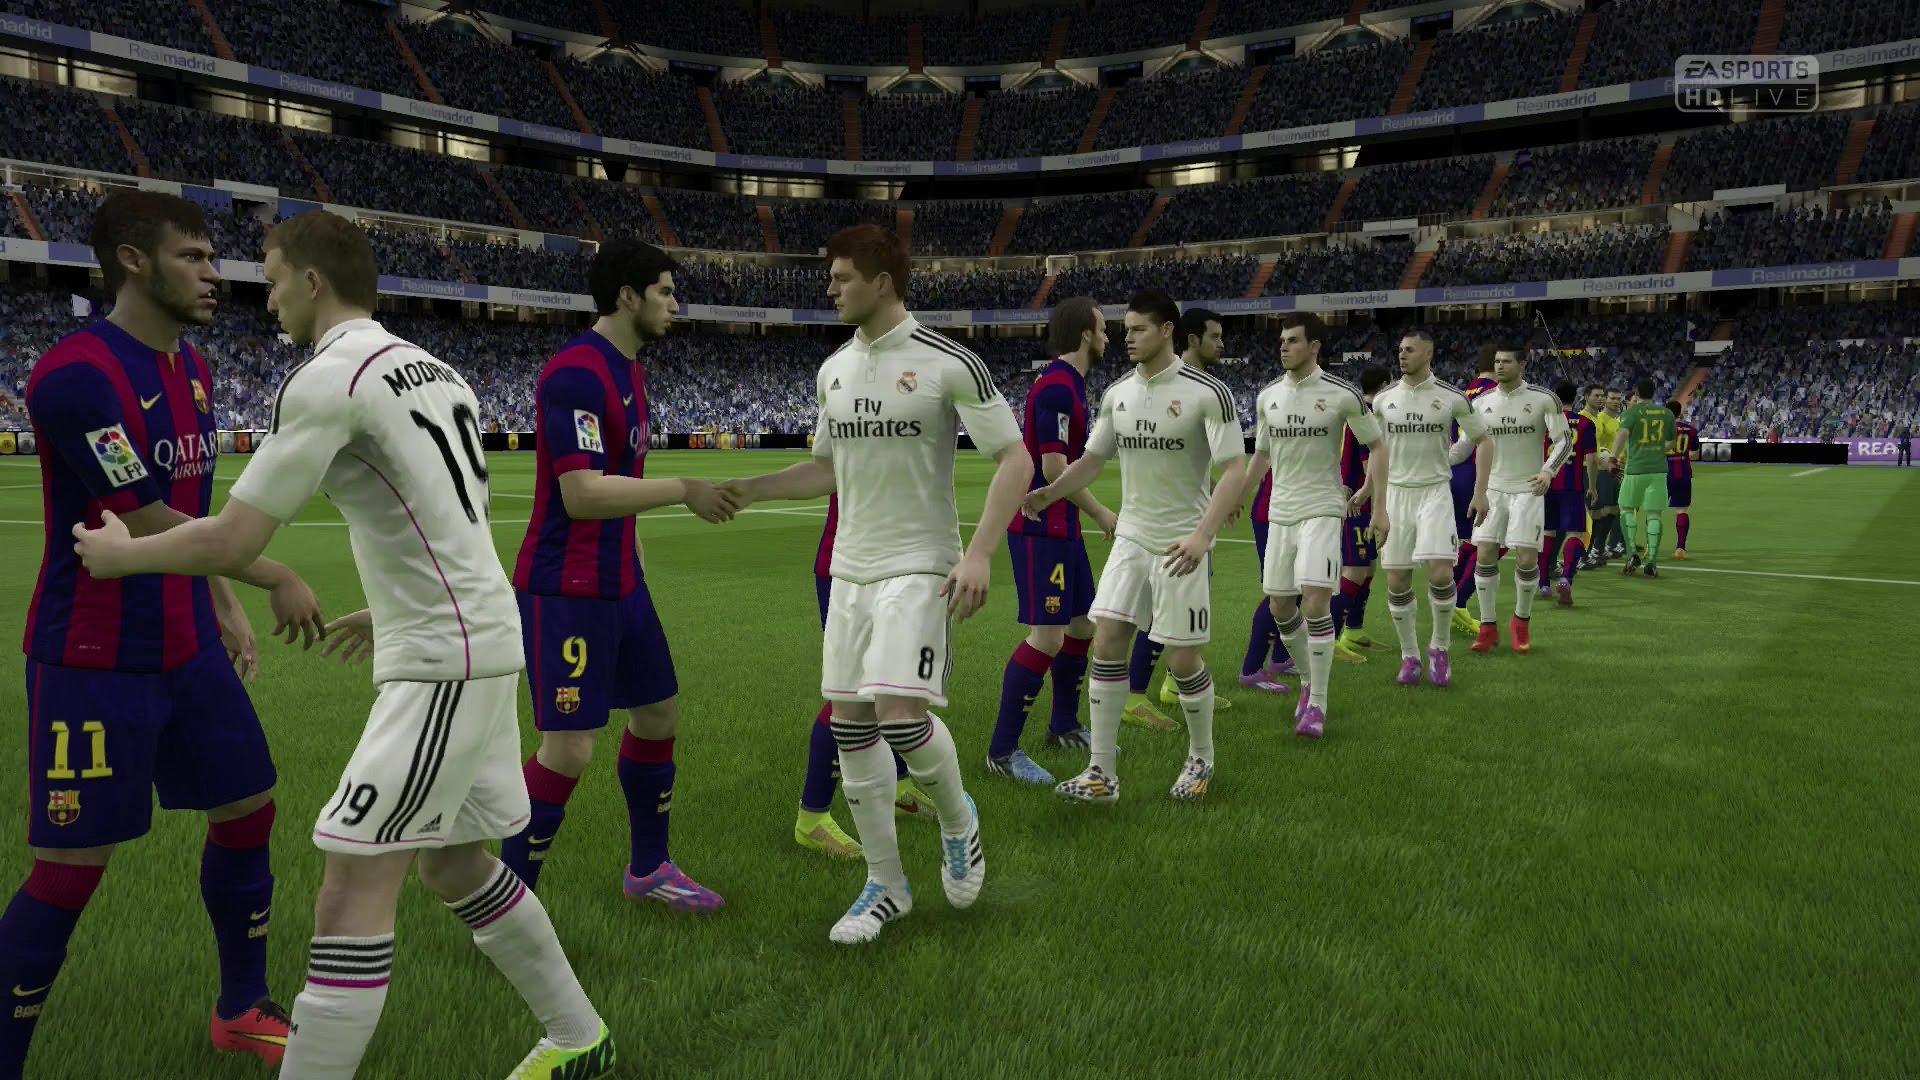 【PS4】FIFA 15